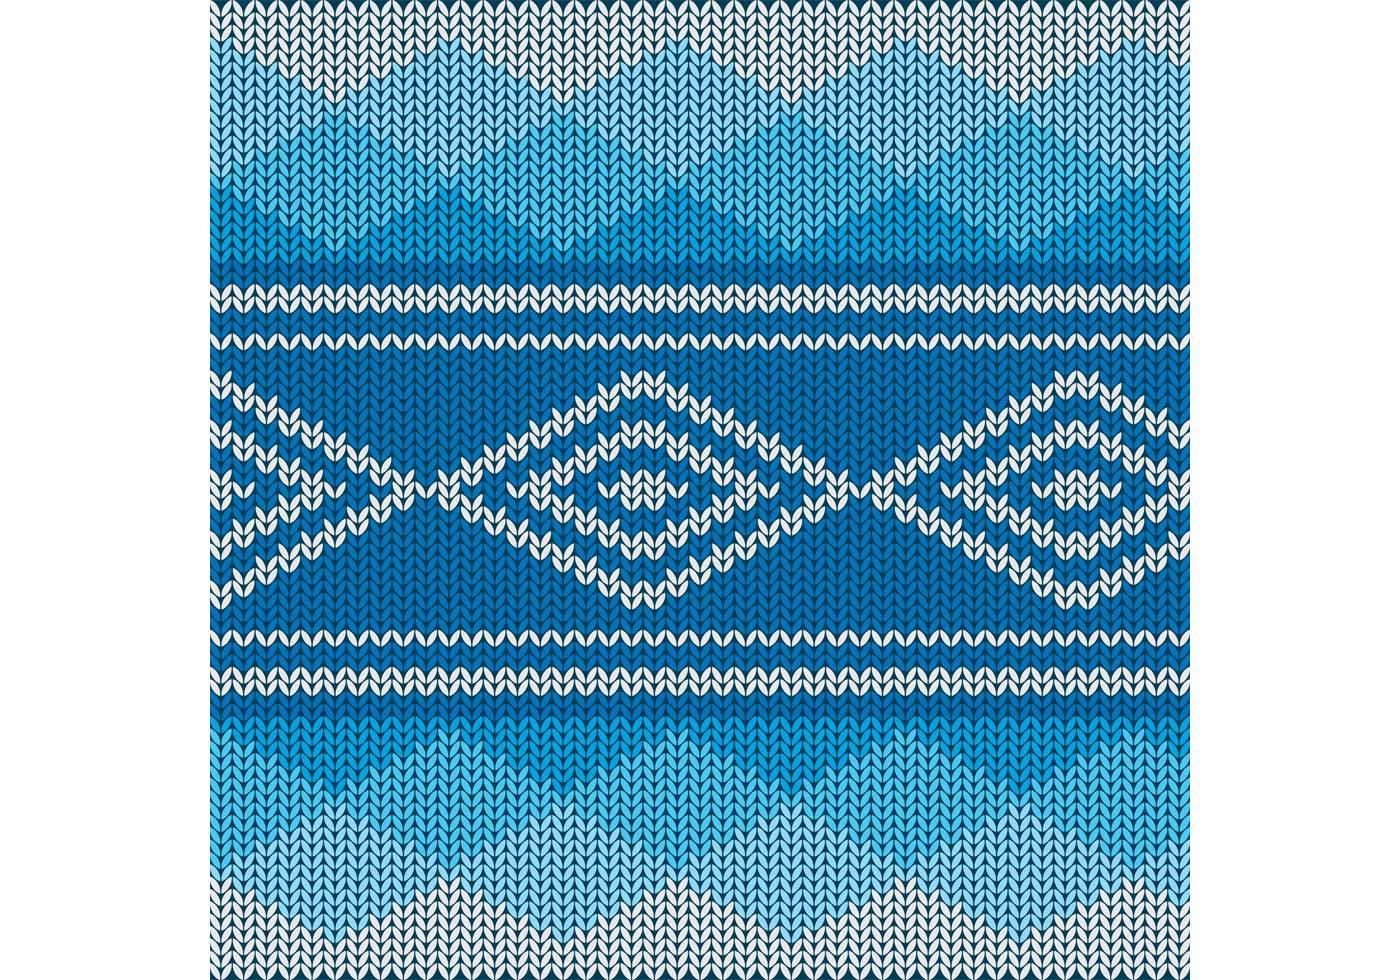 Textile Logo Free Vector Art 7598 Free Downloads